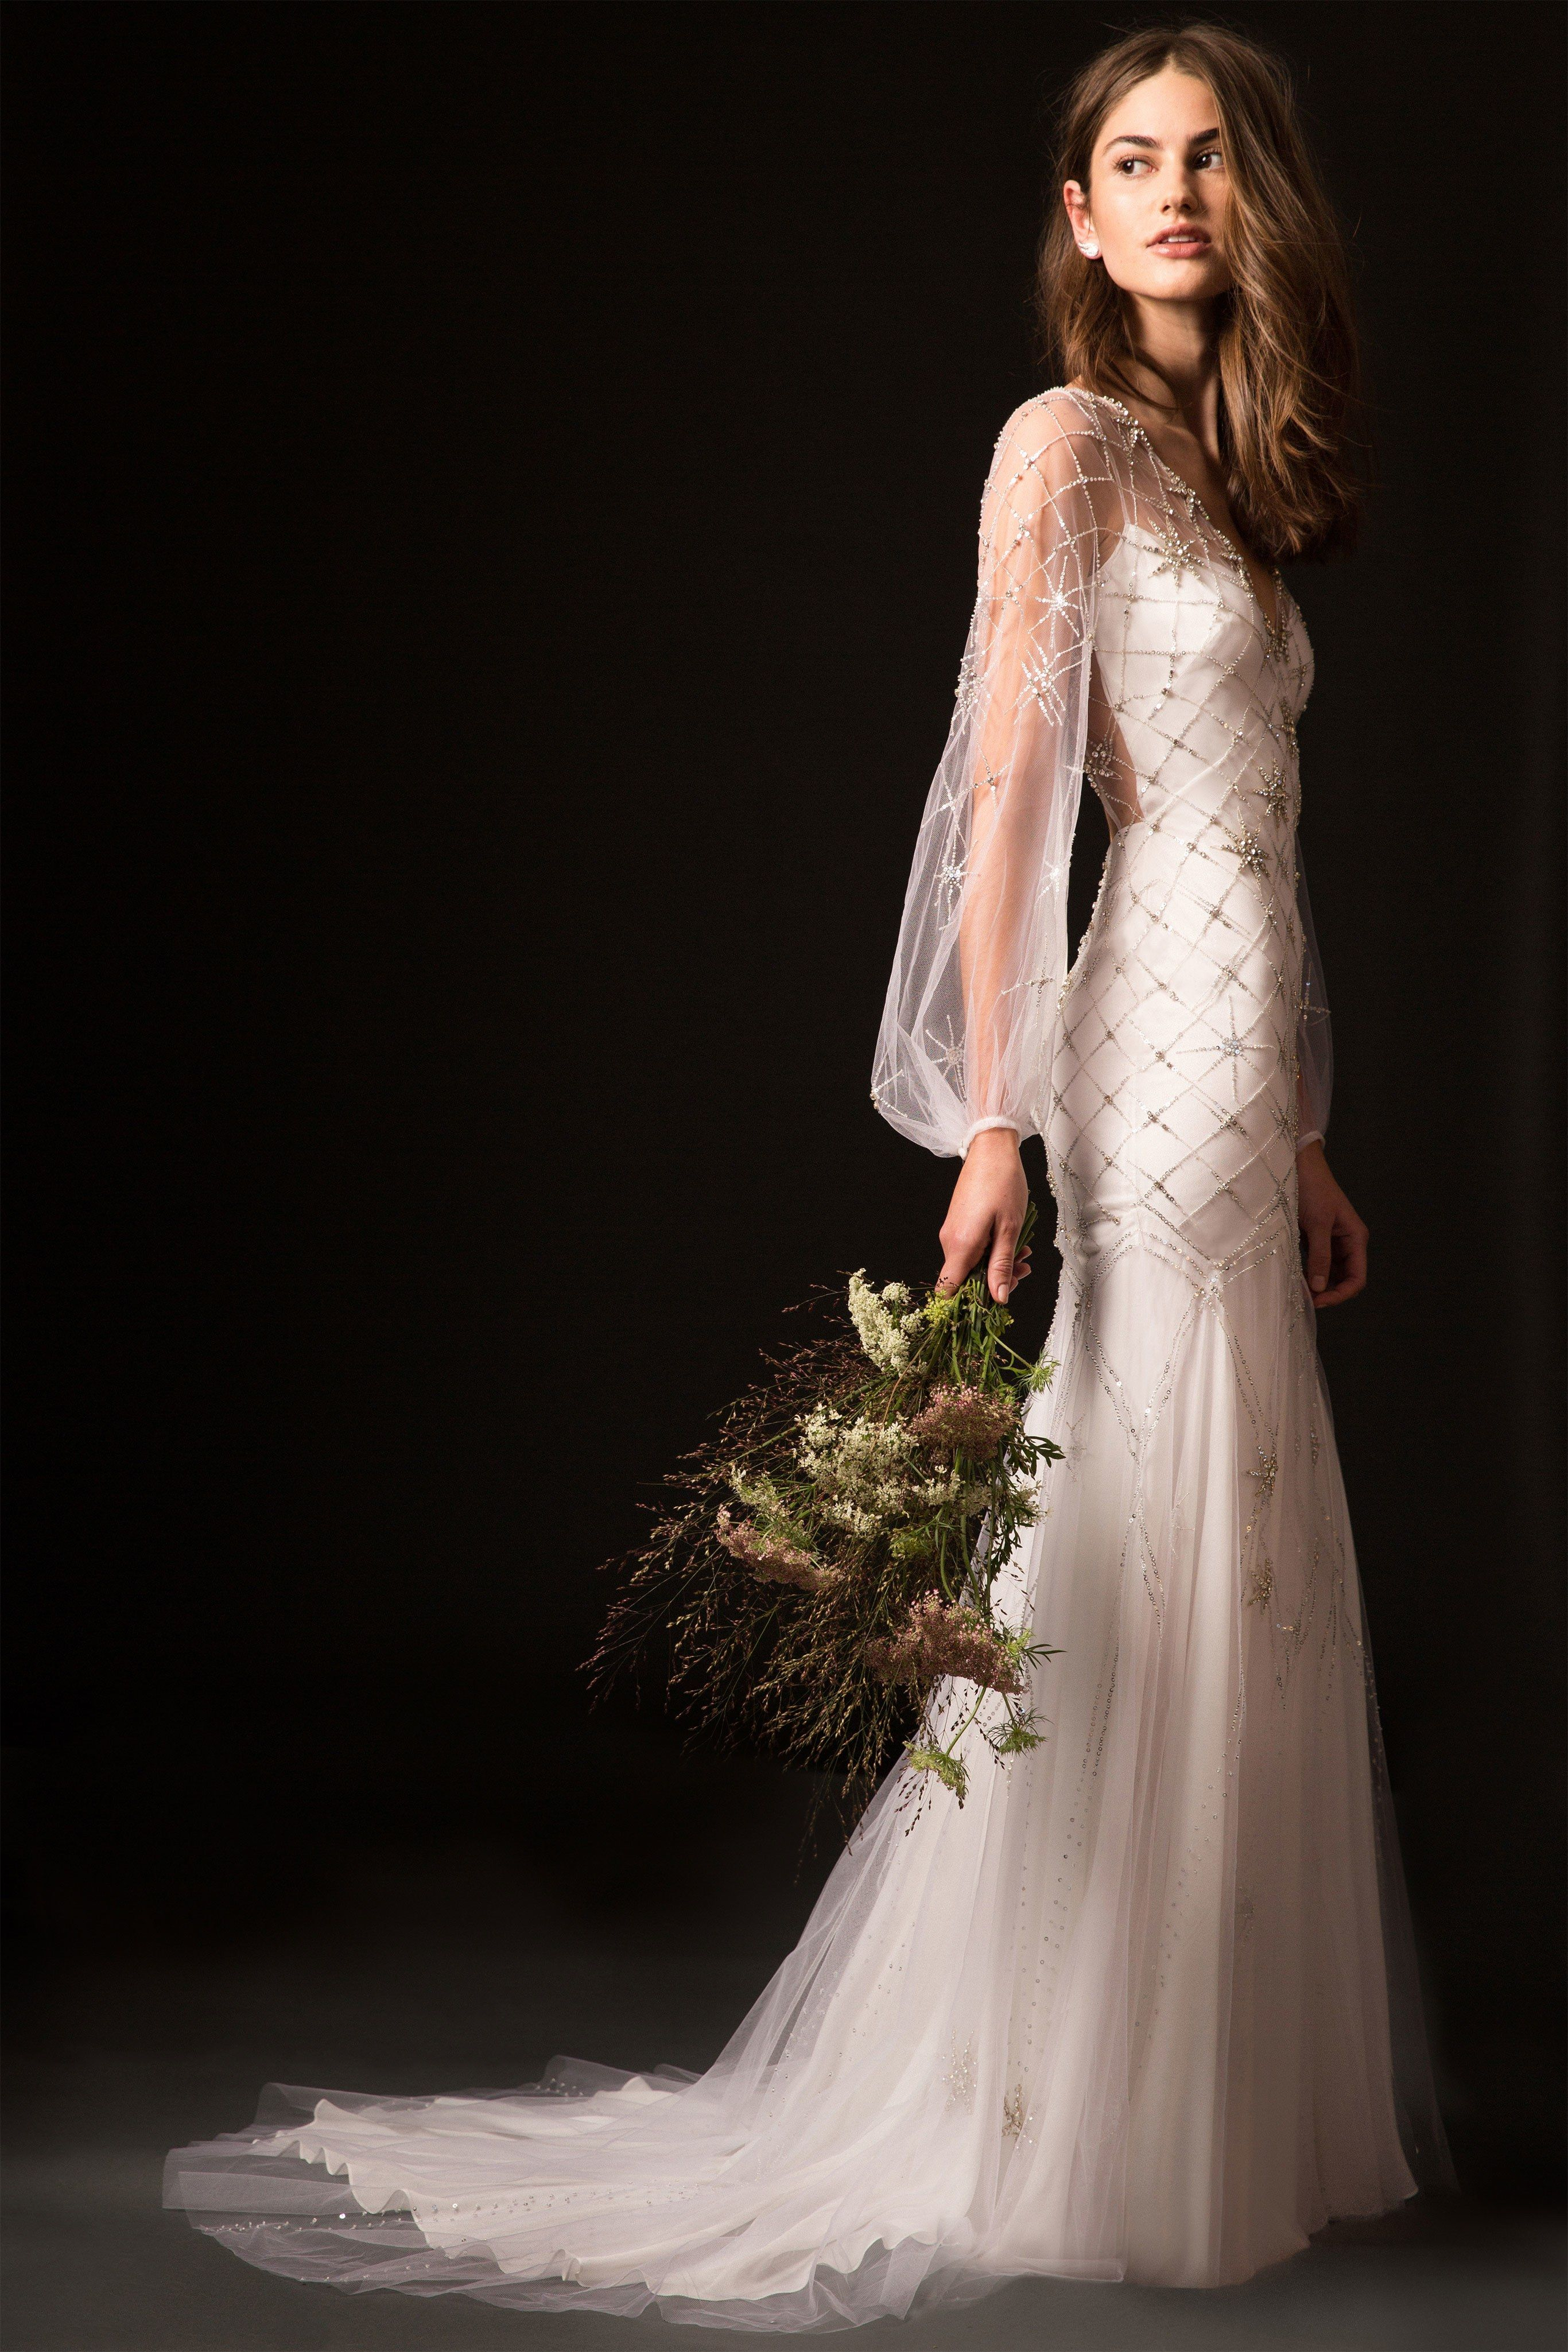 Wedding dress short in front with long train  Temperley London Bridal Fall  Fashion Show  Hazy Whisper